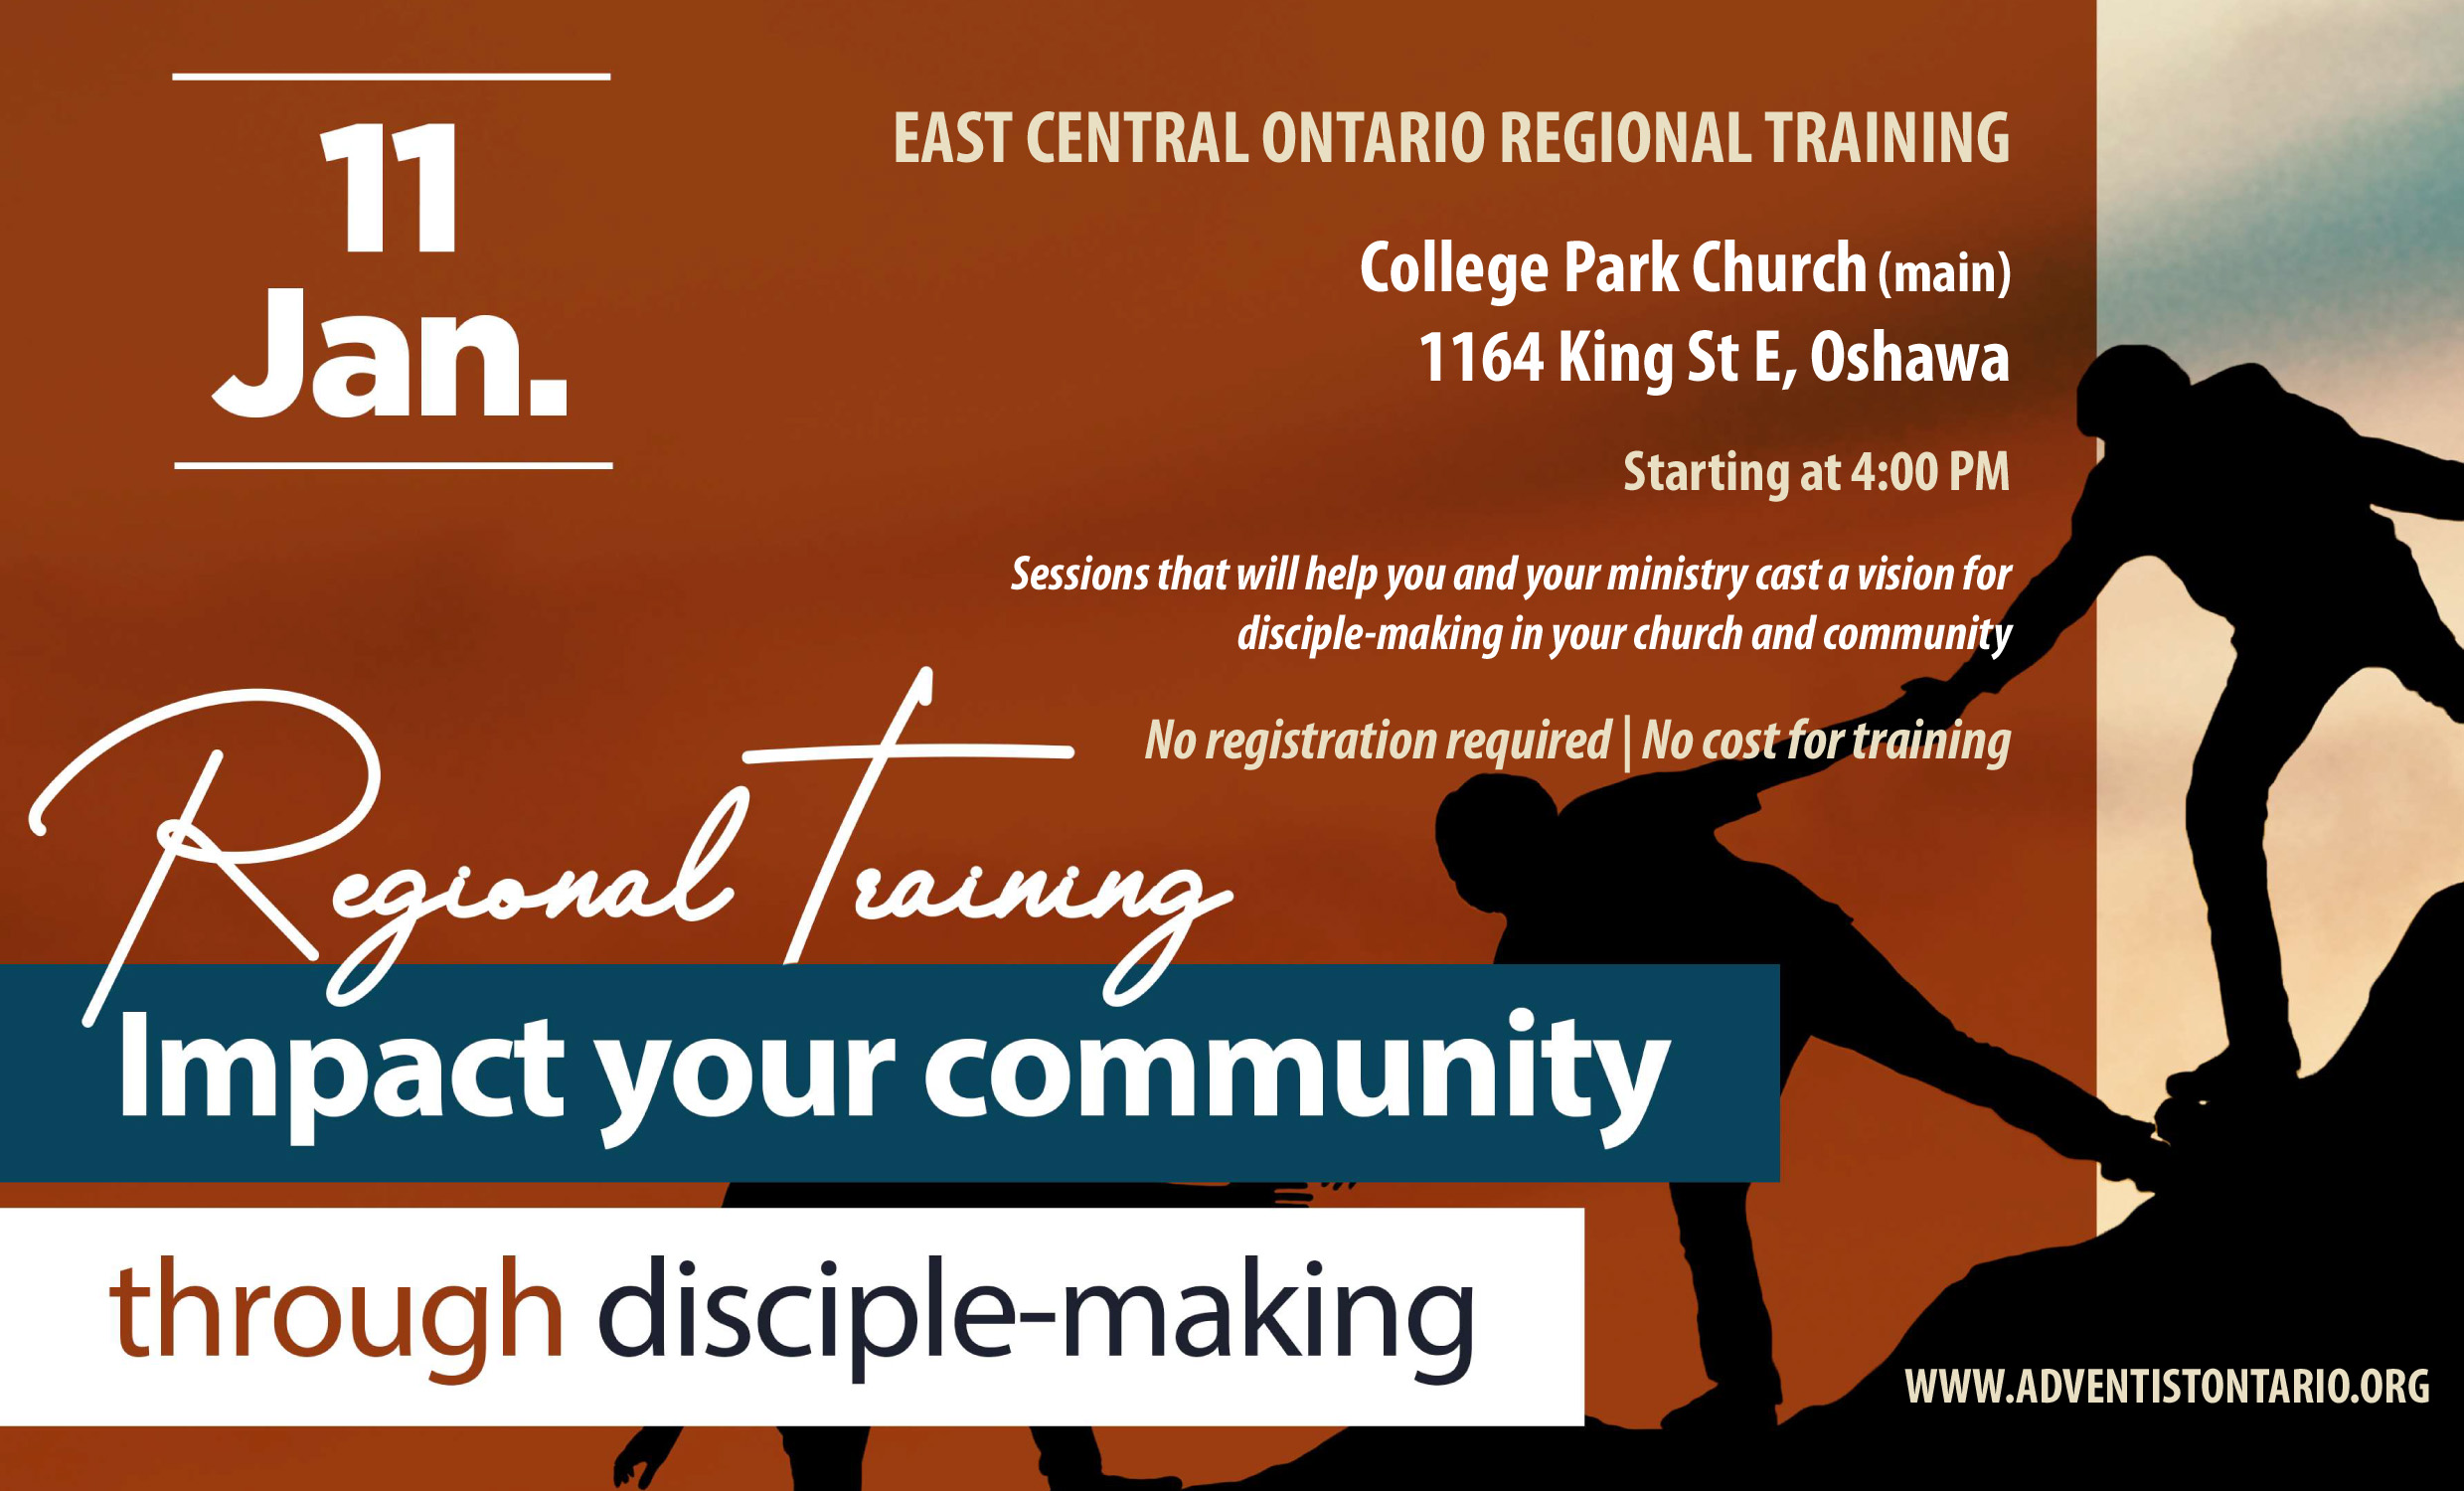 Regional Training Jan 11, 2020